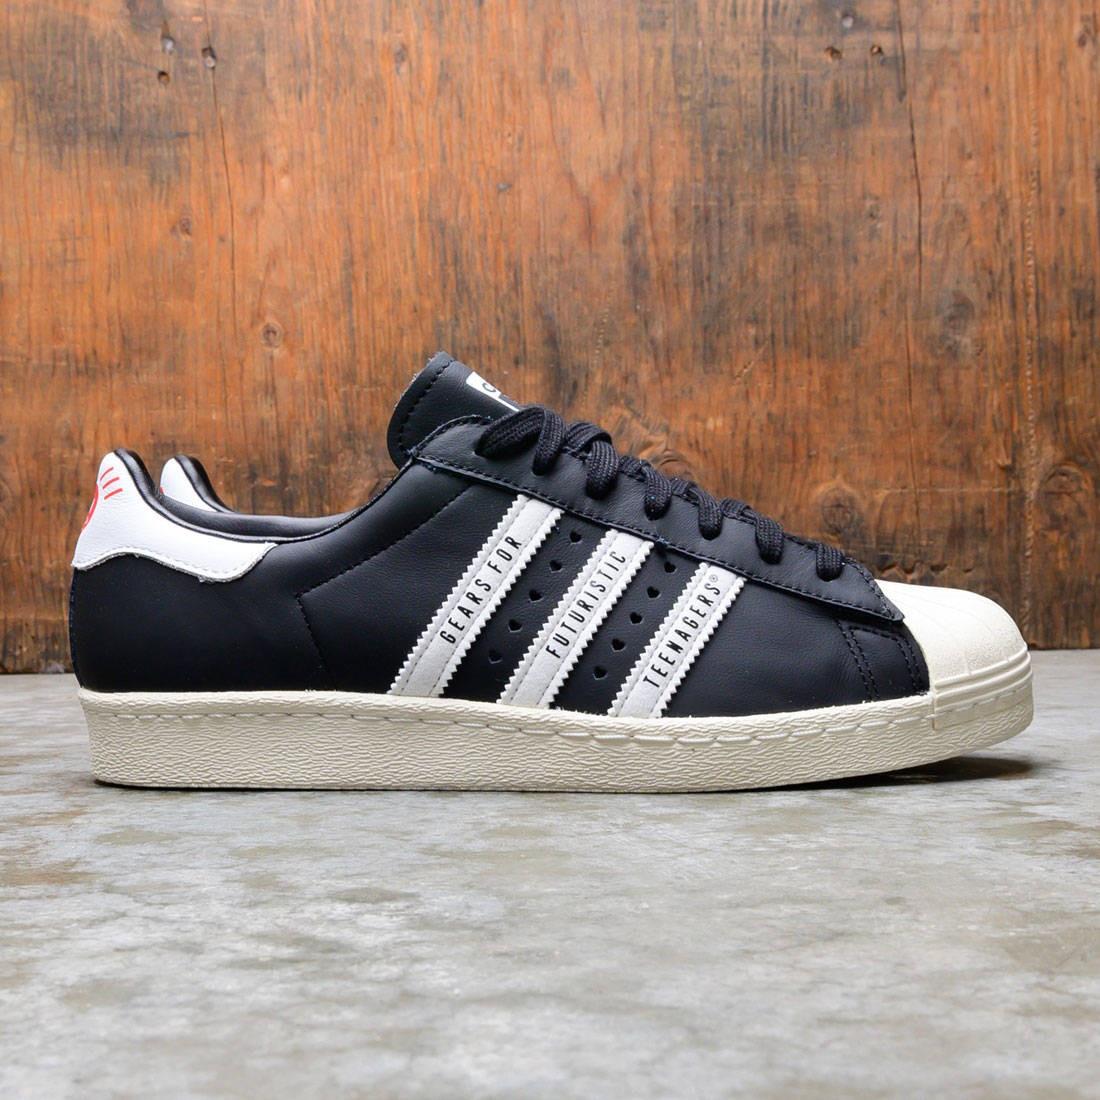 Adidas x Human Made Men Superstar 80s (black / core white / off white)